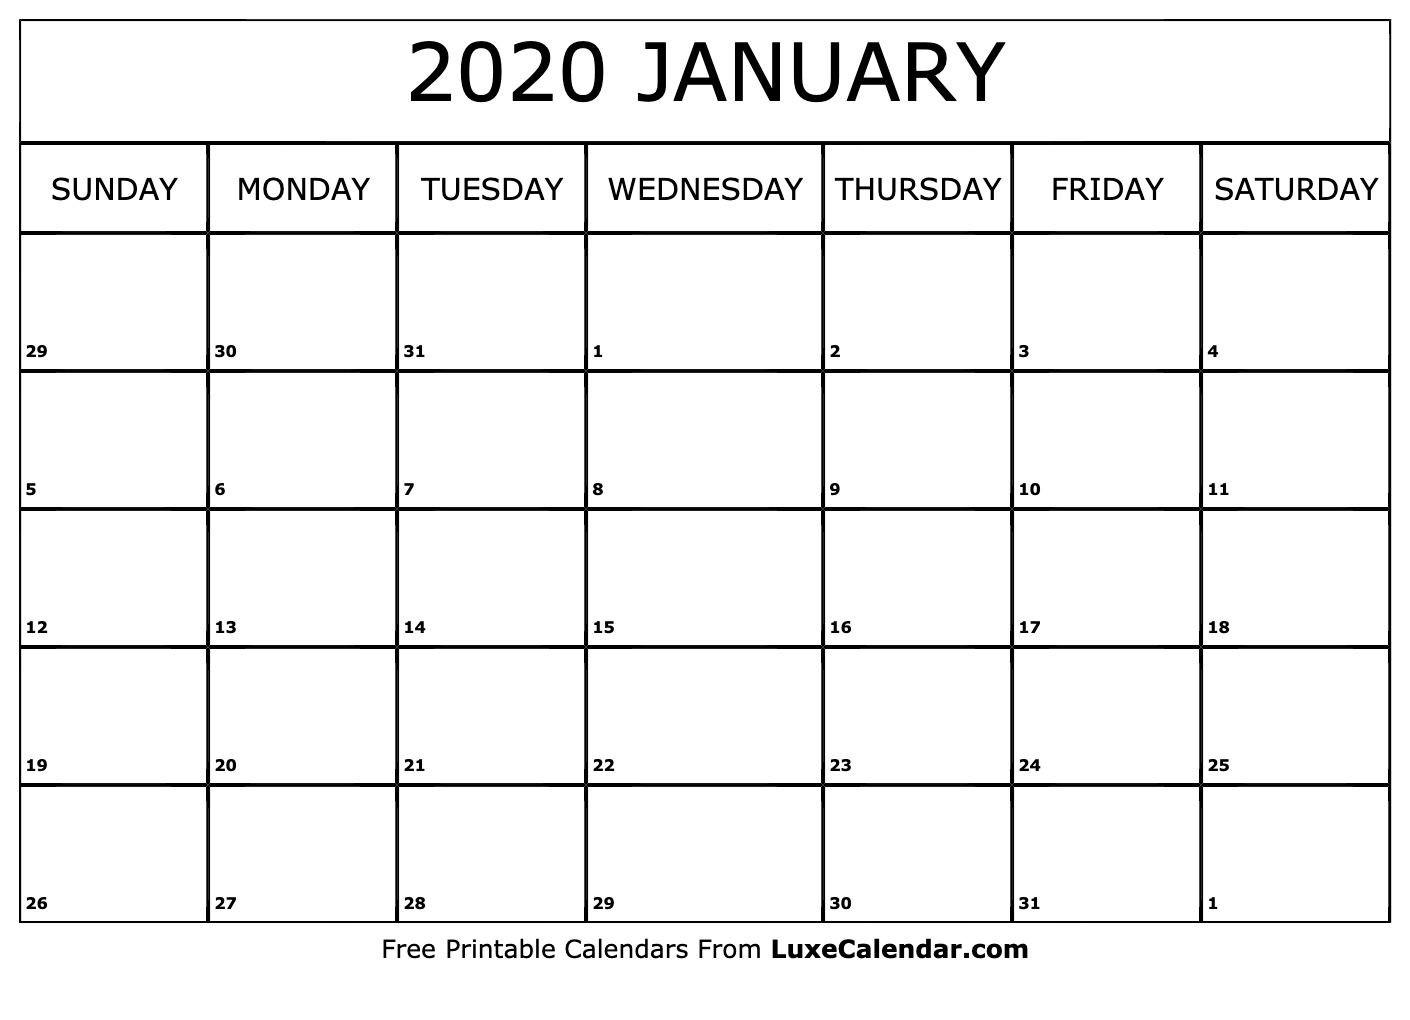 January 2020 Calendar Template | Calendar Template, Calendar  Editable Baptist Calendar 2020 Printable